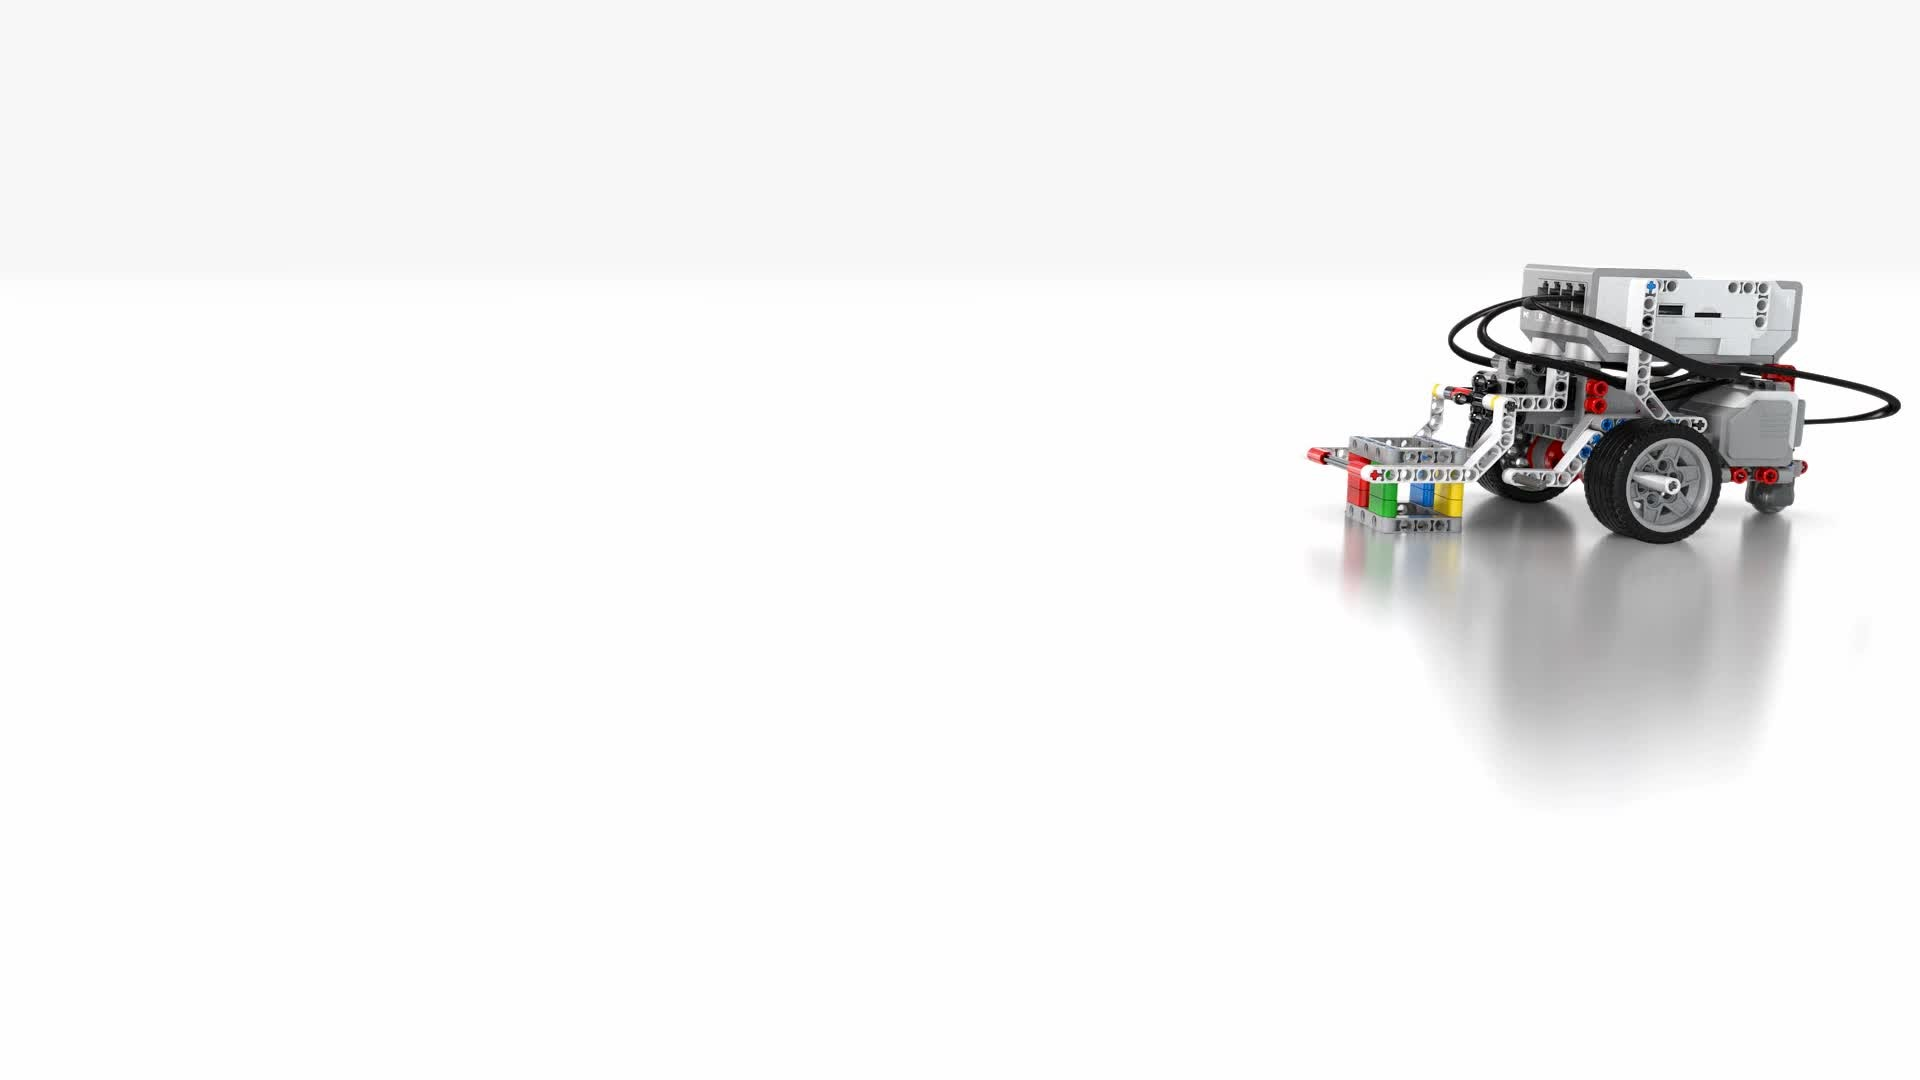 LEGO MINDSTORMS EV3 Windows Themes | Bot Bench